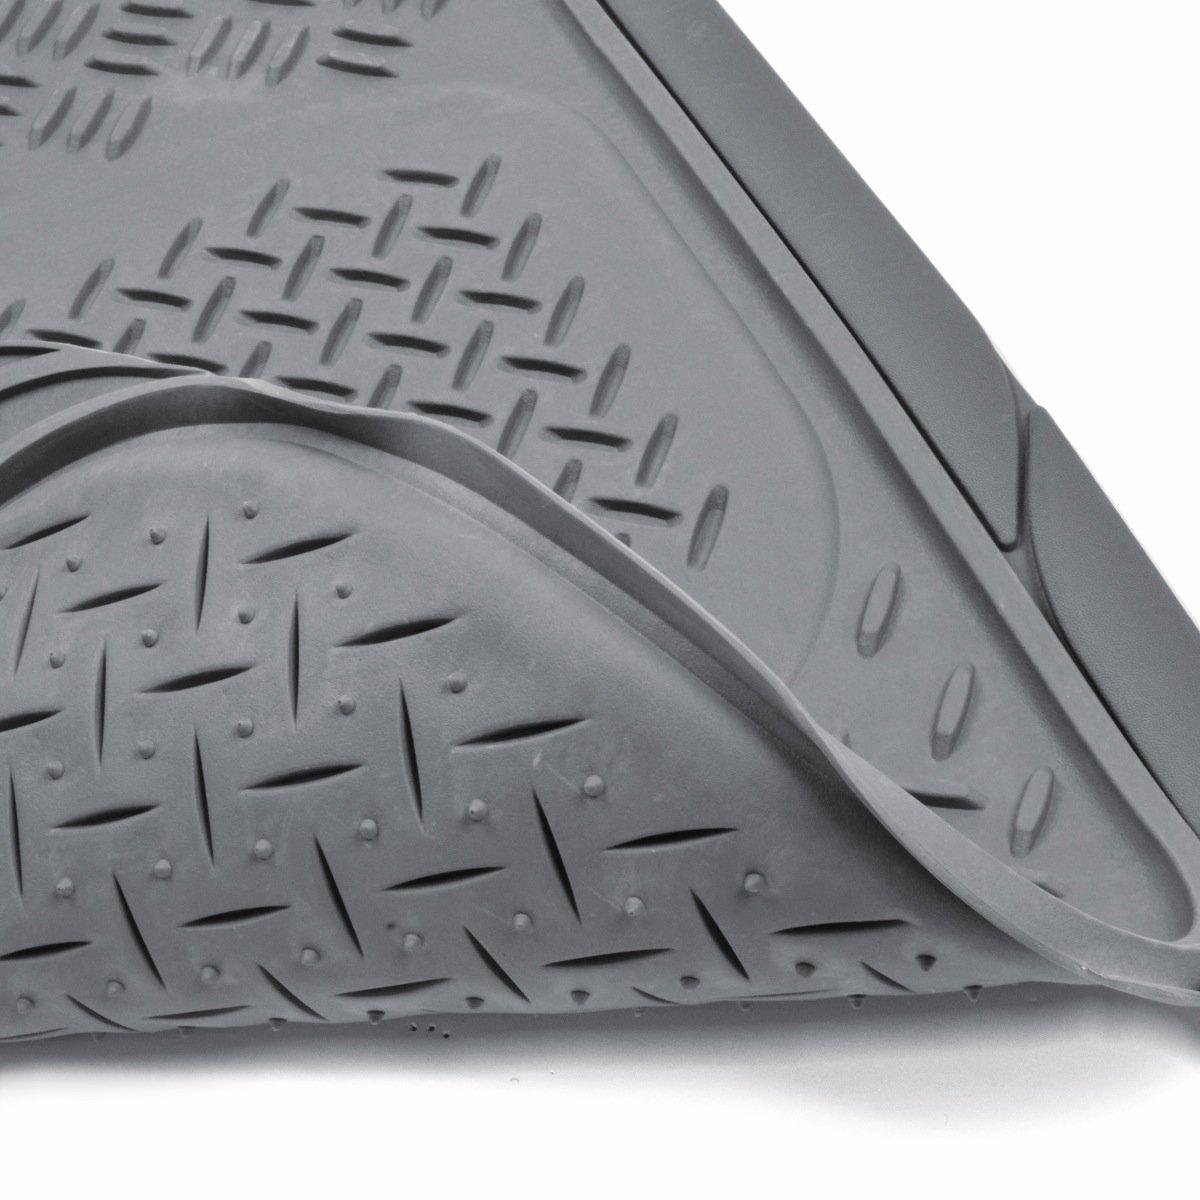 Rubber floor mats minivan - Amazon Com Bdk Heavy Duty Van Suv Rubber Floor Mats 4 Pieces 3 Rows Full Set All Weather Trimmable Mat Gray Automotive